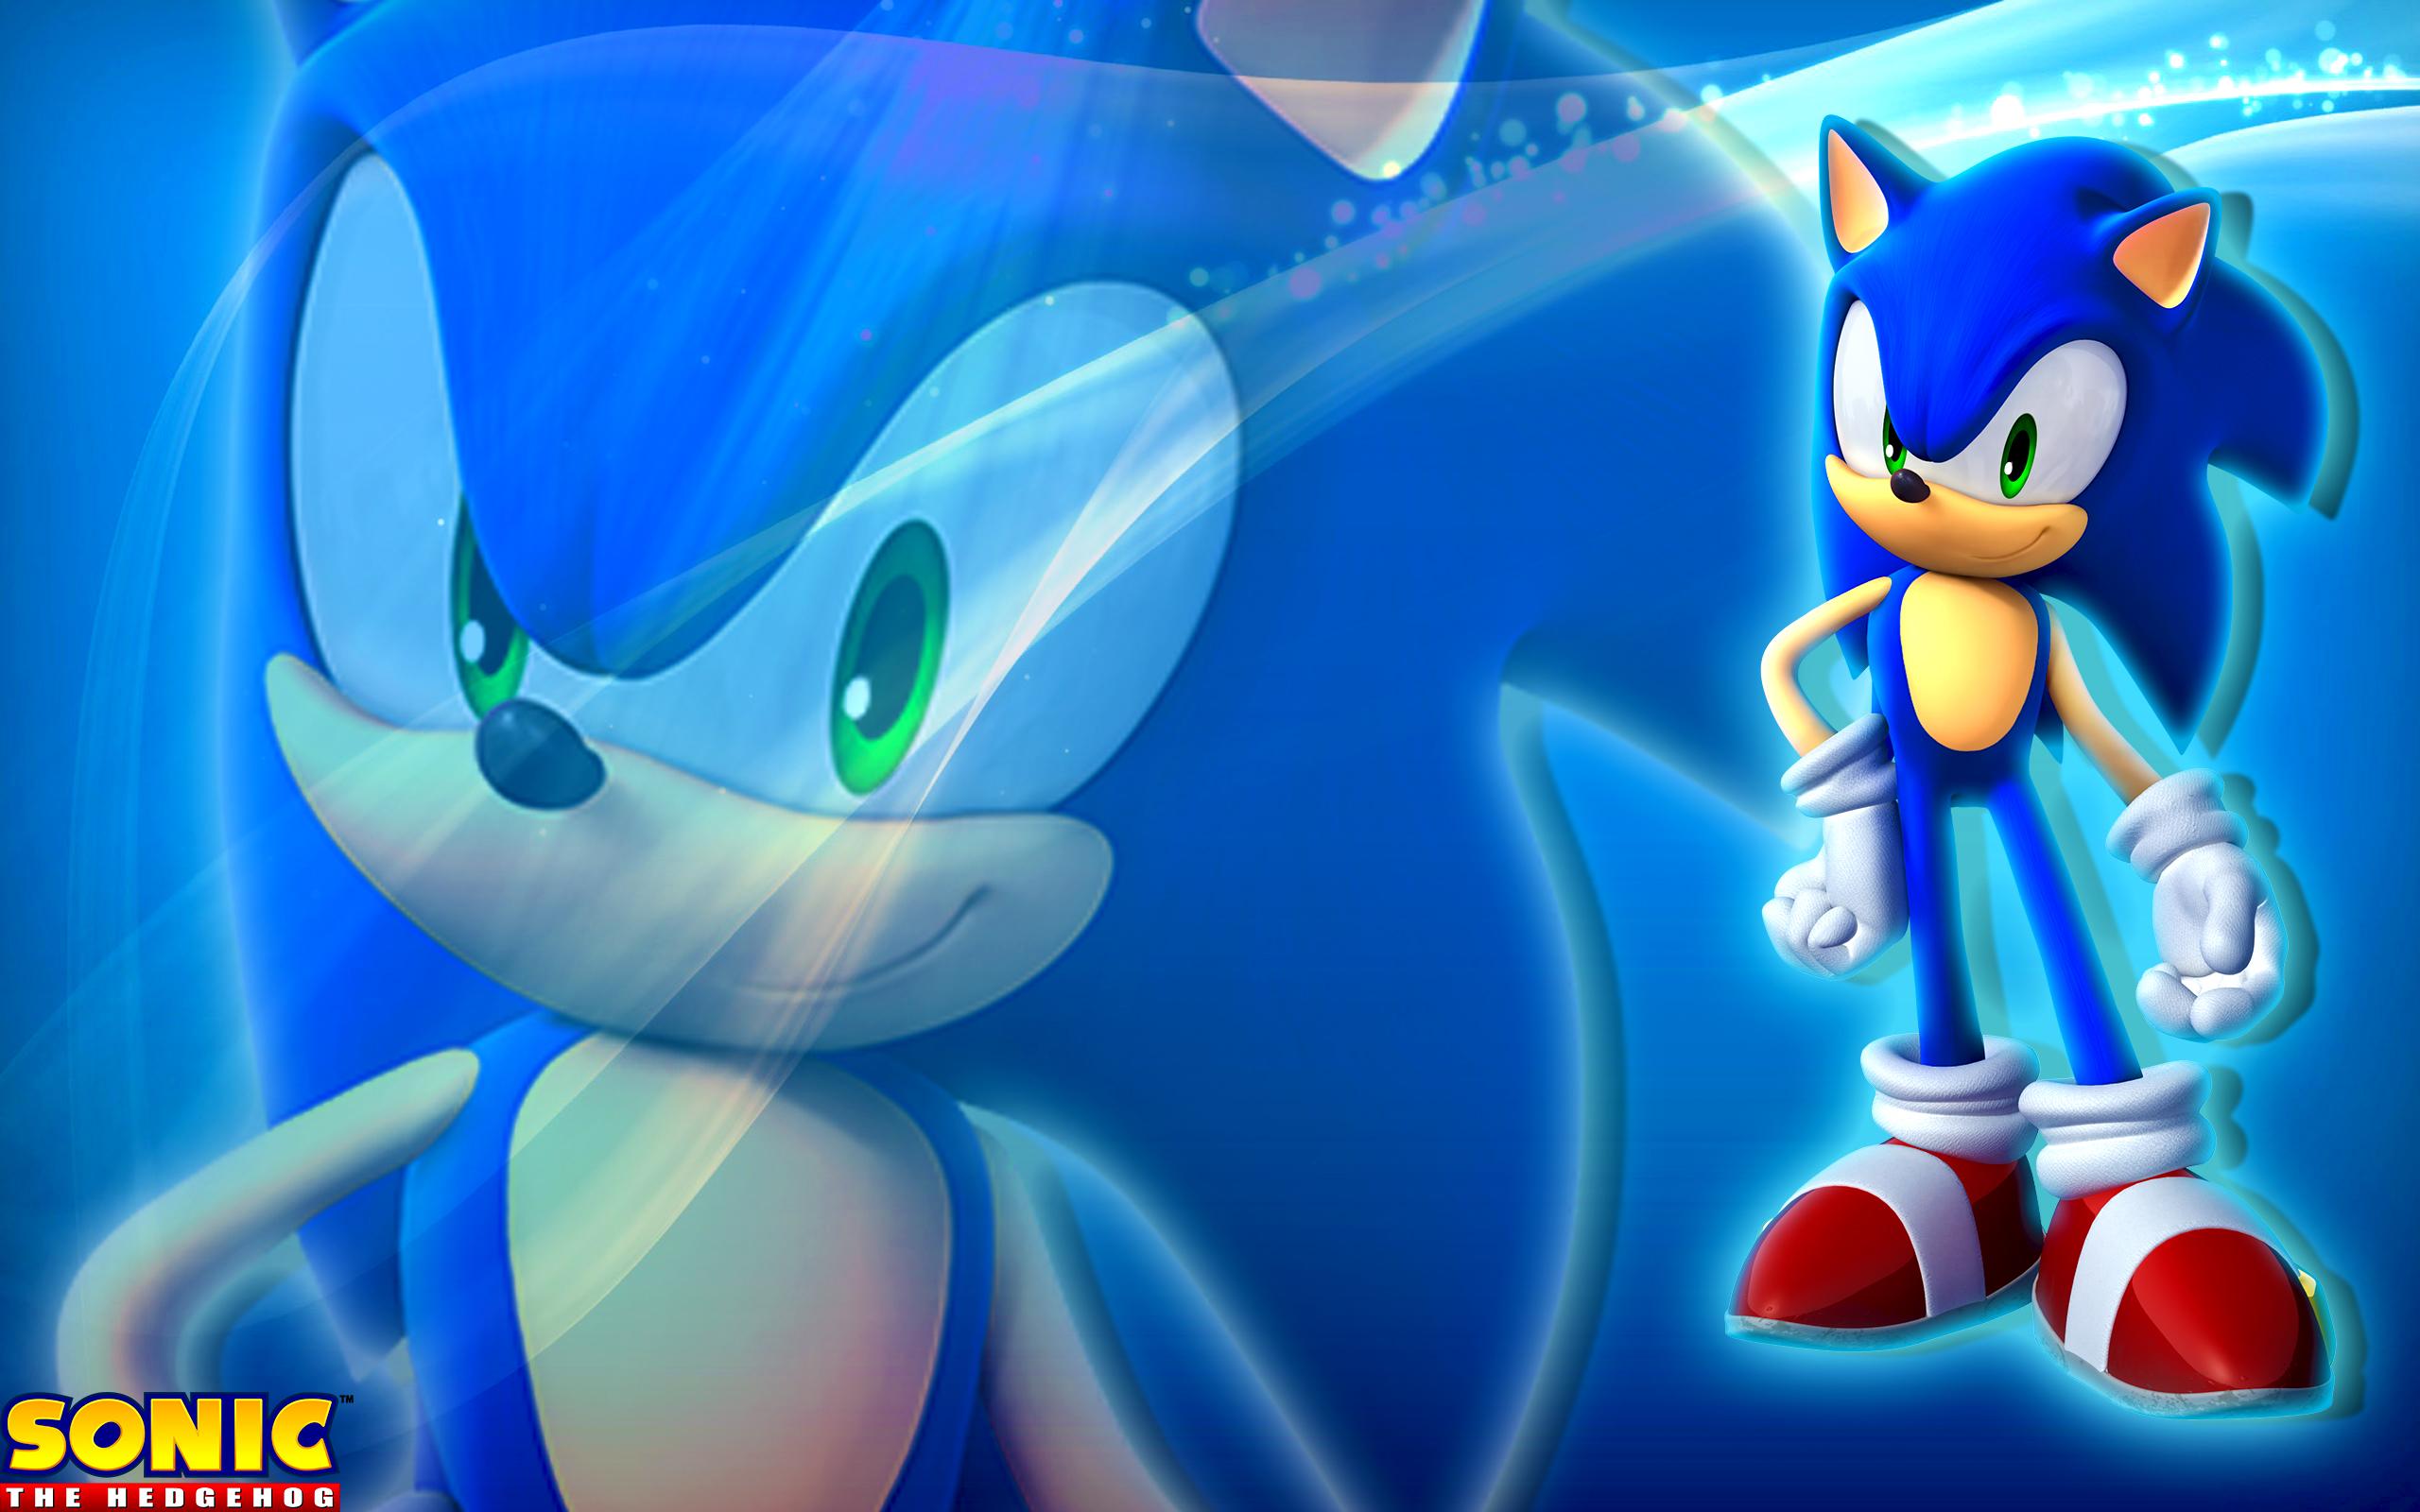 76+] Sonic Hedgehog Wallpaper on WallpaperSafari